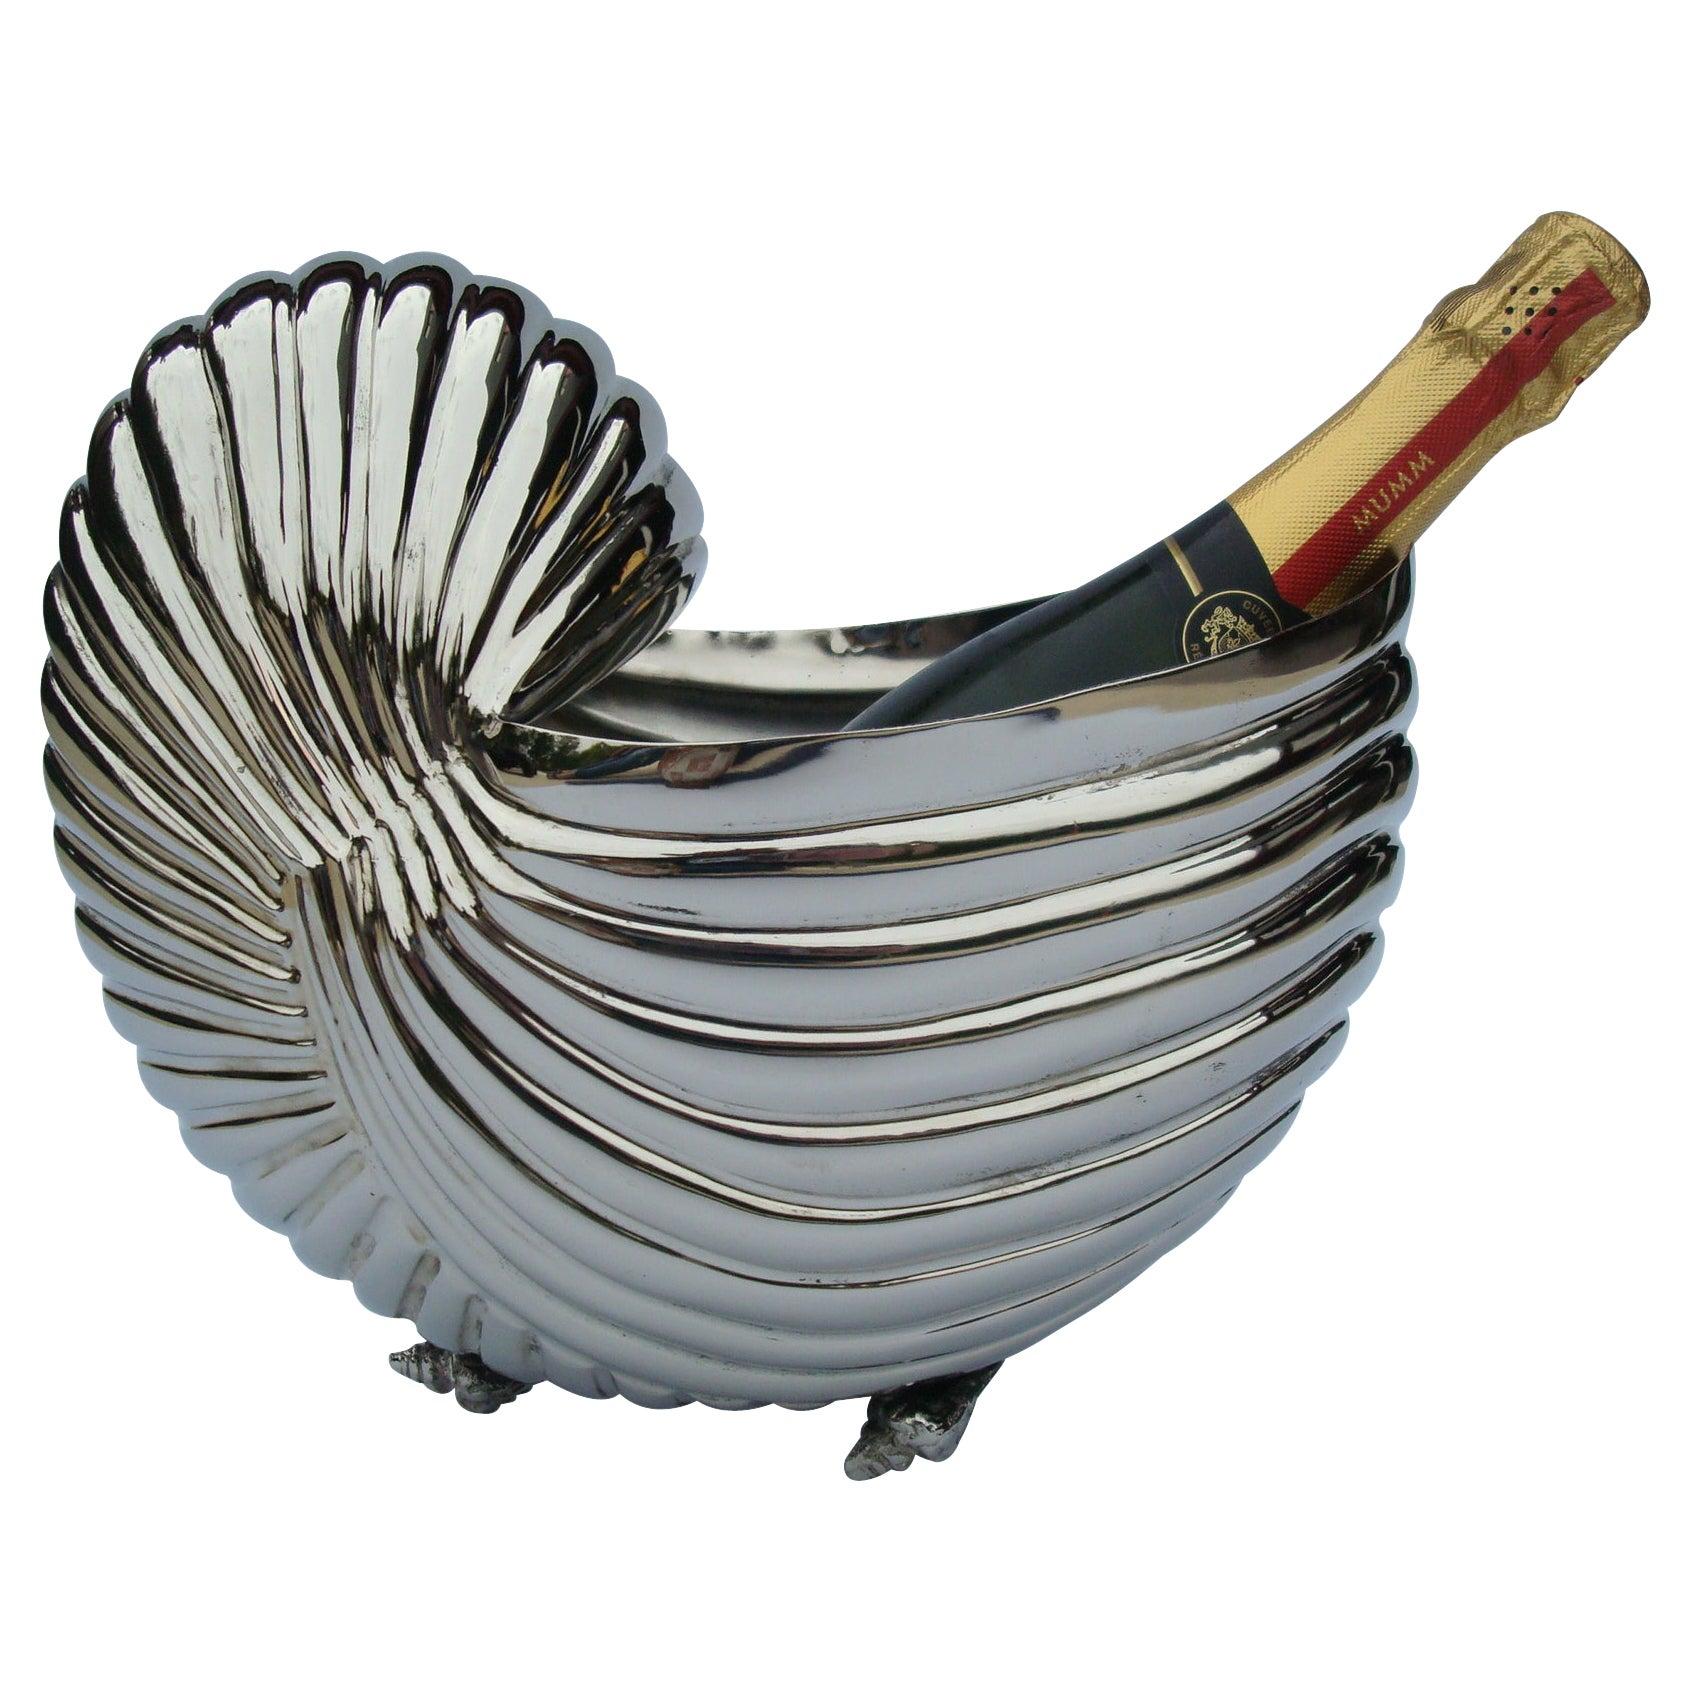 Nautilus Sea Shell Wine / Champagne Cooler Bottle Holder / Ice Bucket